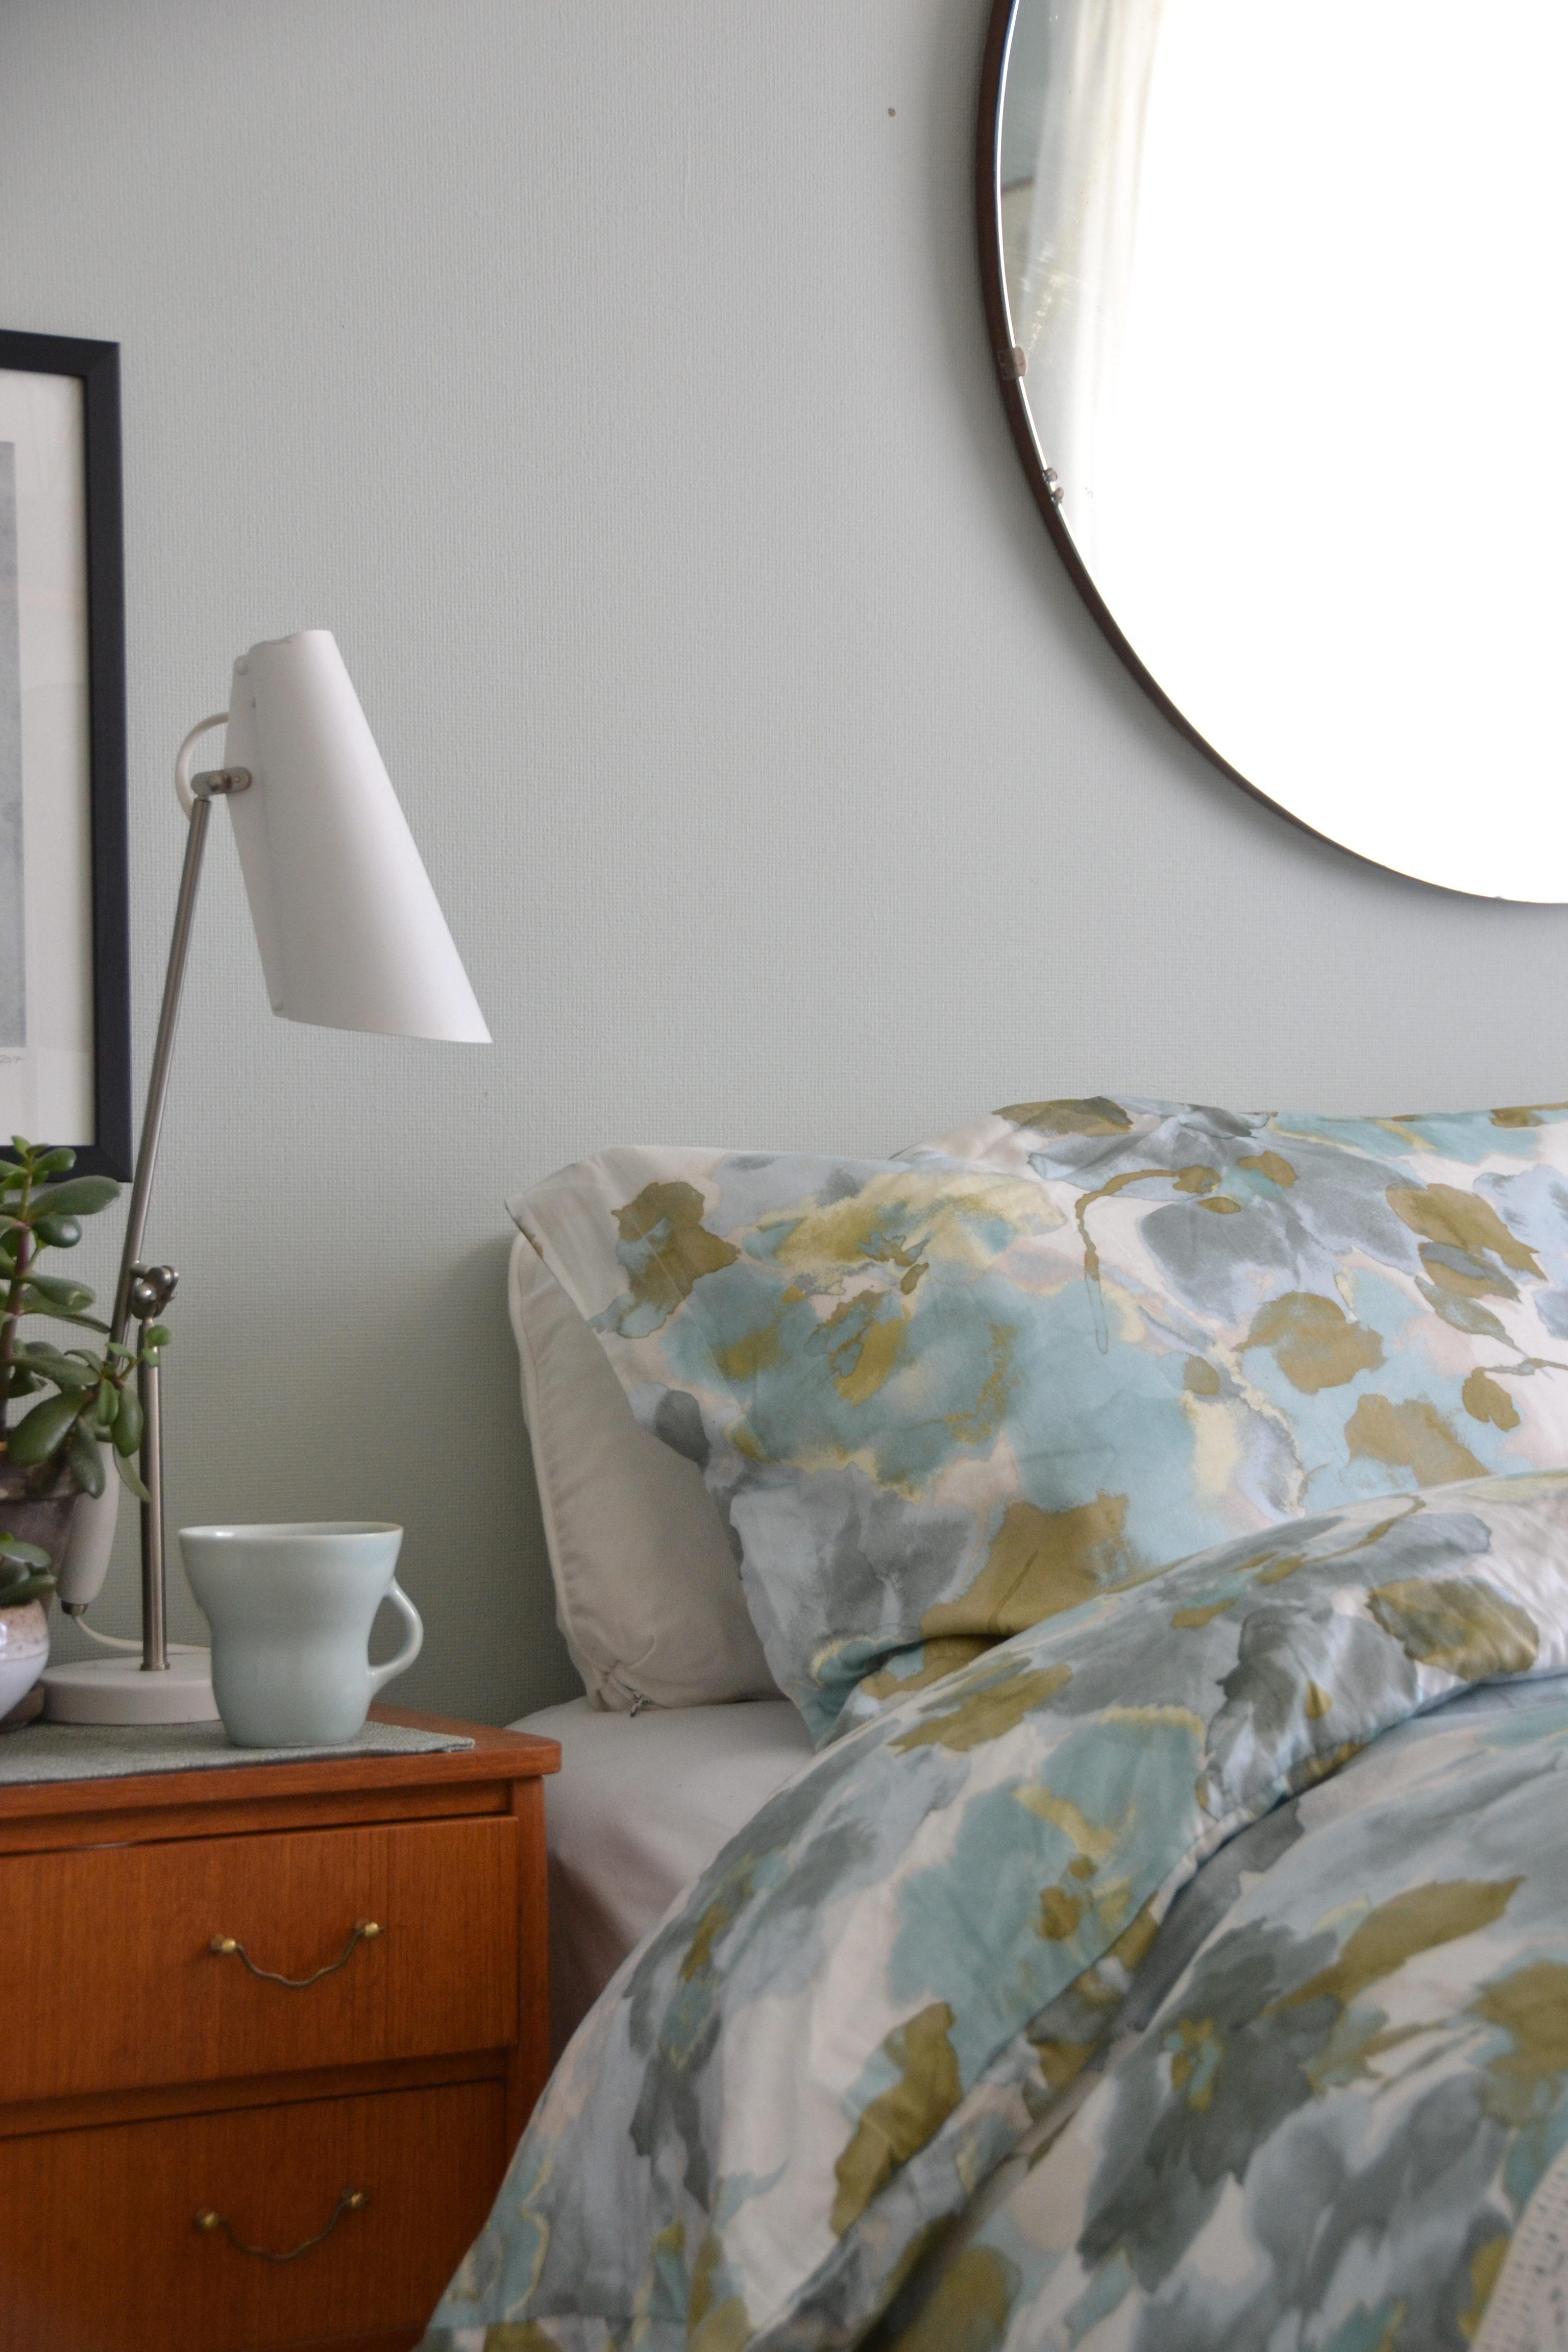 Bedroom styling, soverommet, style soverommet, midcentury modern, pernille folcarelli, Høie, Høie sengetøy, bedroom decor, bedroom interior, resignert signe, signe schineller, Rosendal minty breeze,